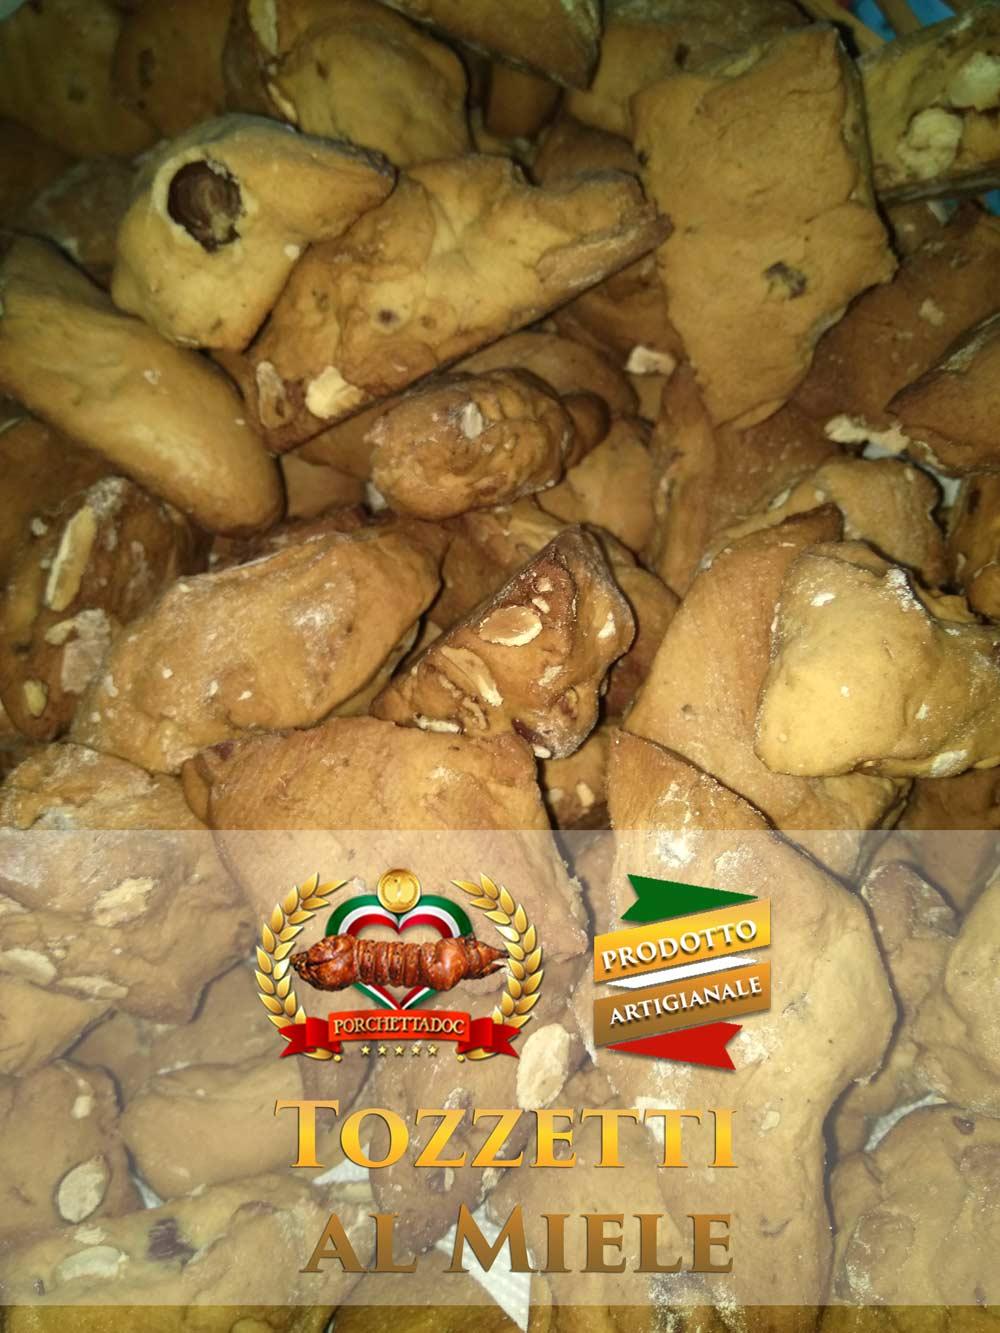 tozzetti-al-miele-artigianali-ariccia Tozzetti al Miele 1 Kg.